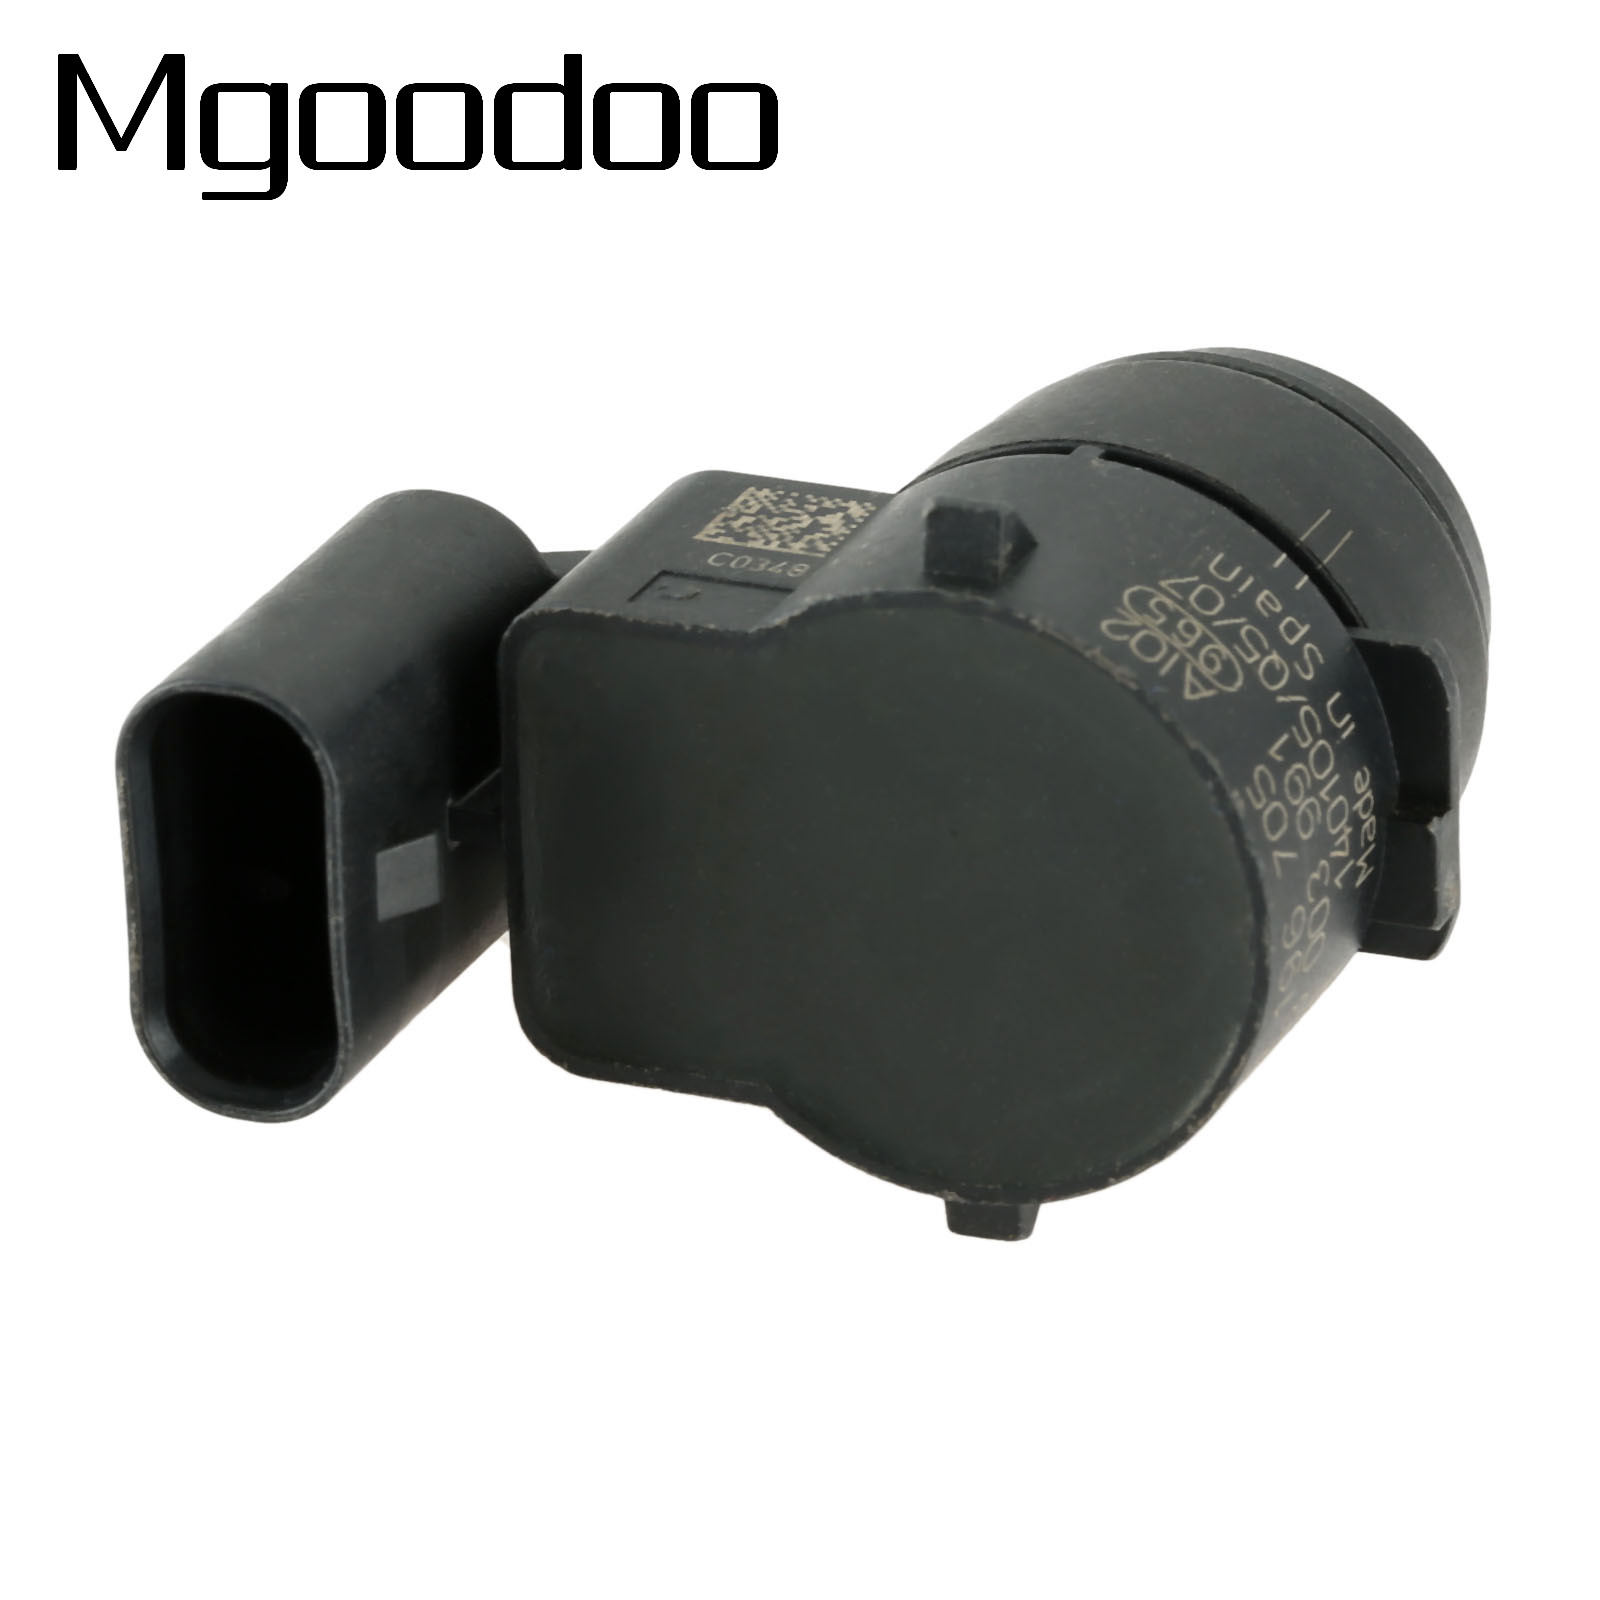 66206934308 Park Assist Sensor For BMW 128i 135i 325xi 328i 328xi 330xi 335xi M3